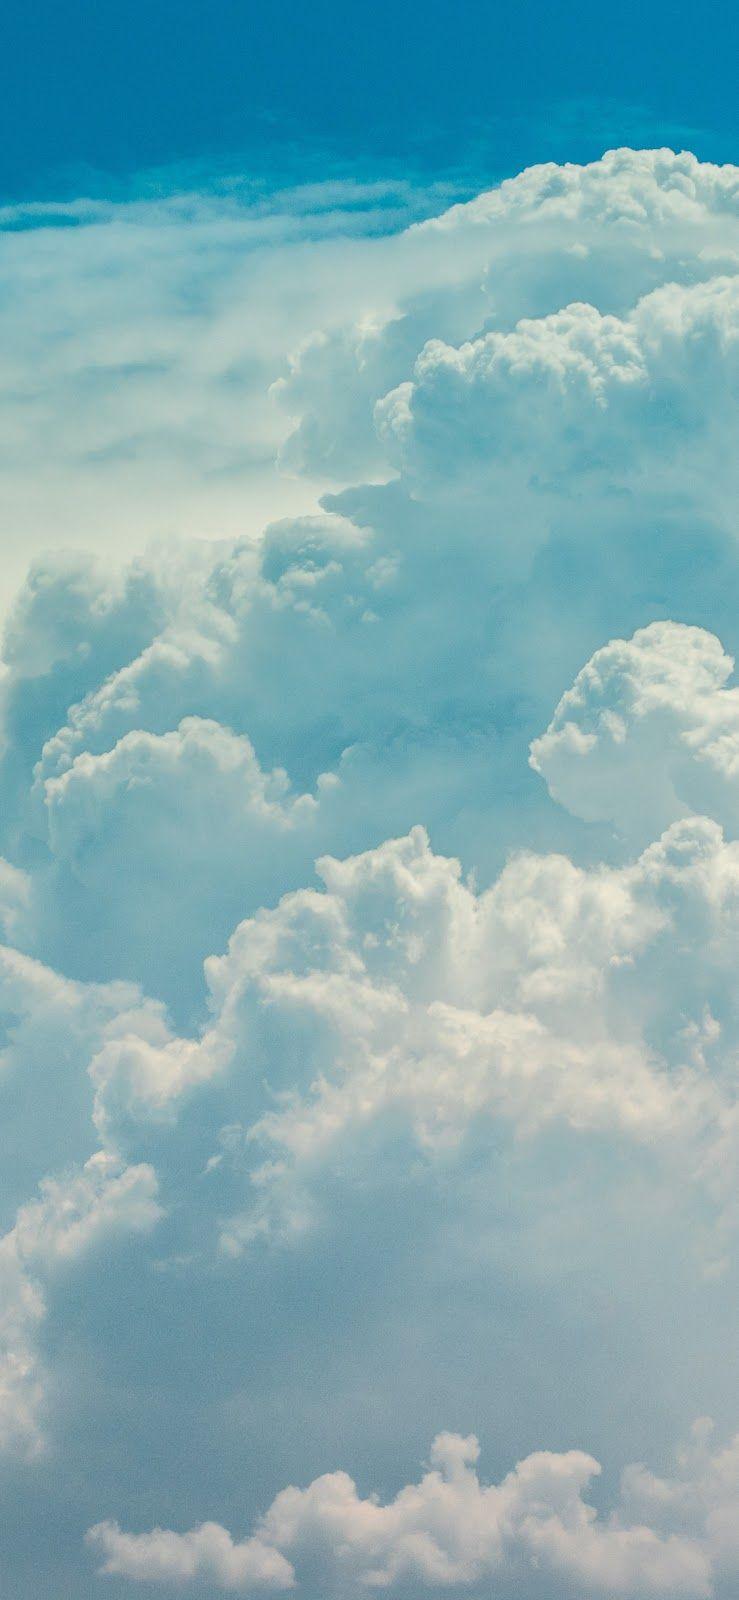 Cloudy Sky Iphone X Iphone Backgrounds Nature Iphone Wallpaper Sky Blue Sky Wallpaper